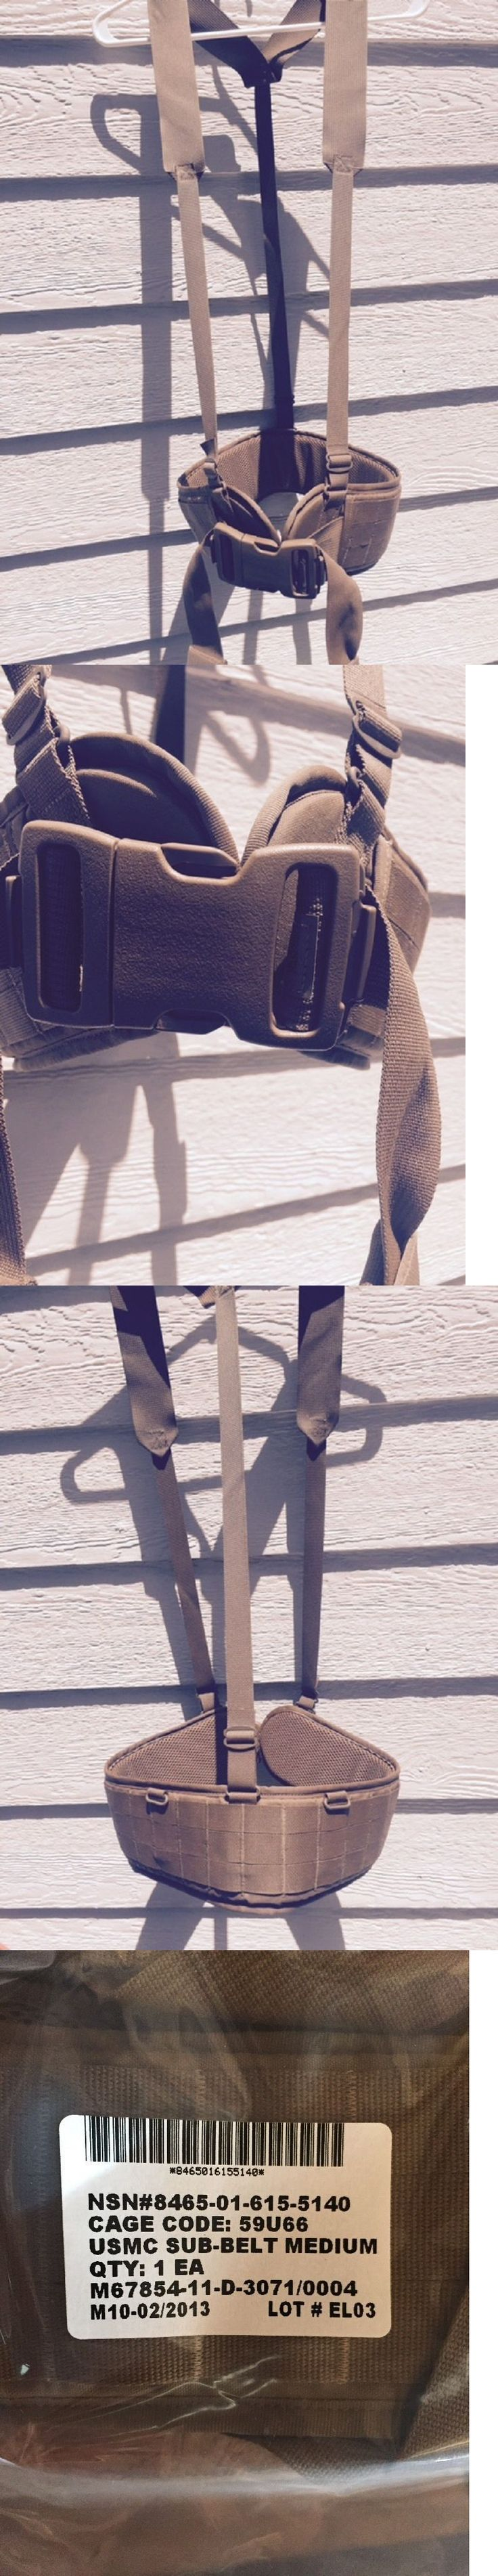 Black leather work gloves nsn - Other Emergency Gear 181415 Usmc Padded War Ilbe Pistol Utility Molle Sub Belt Size Medium